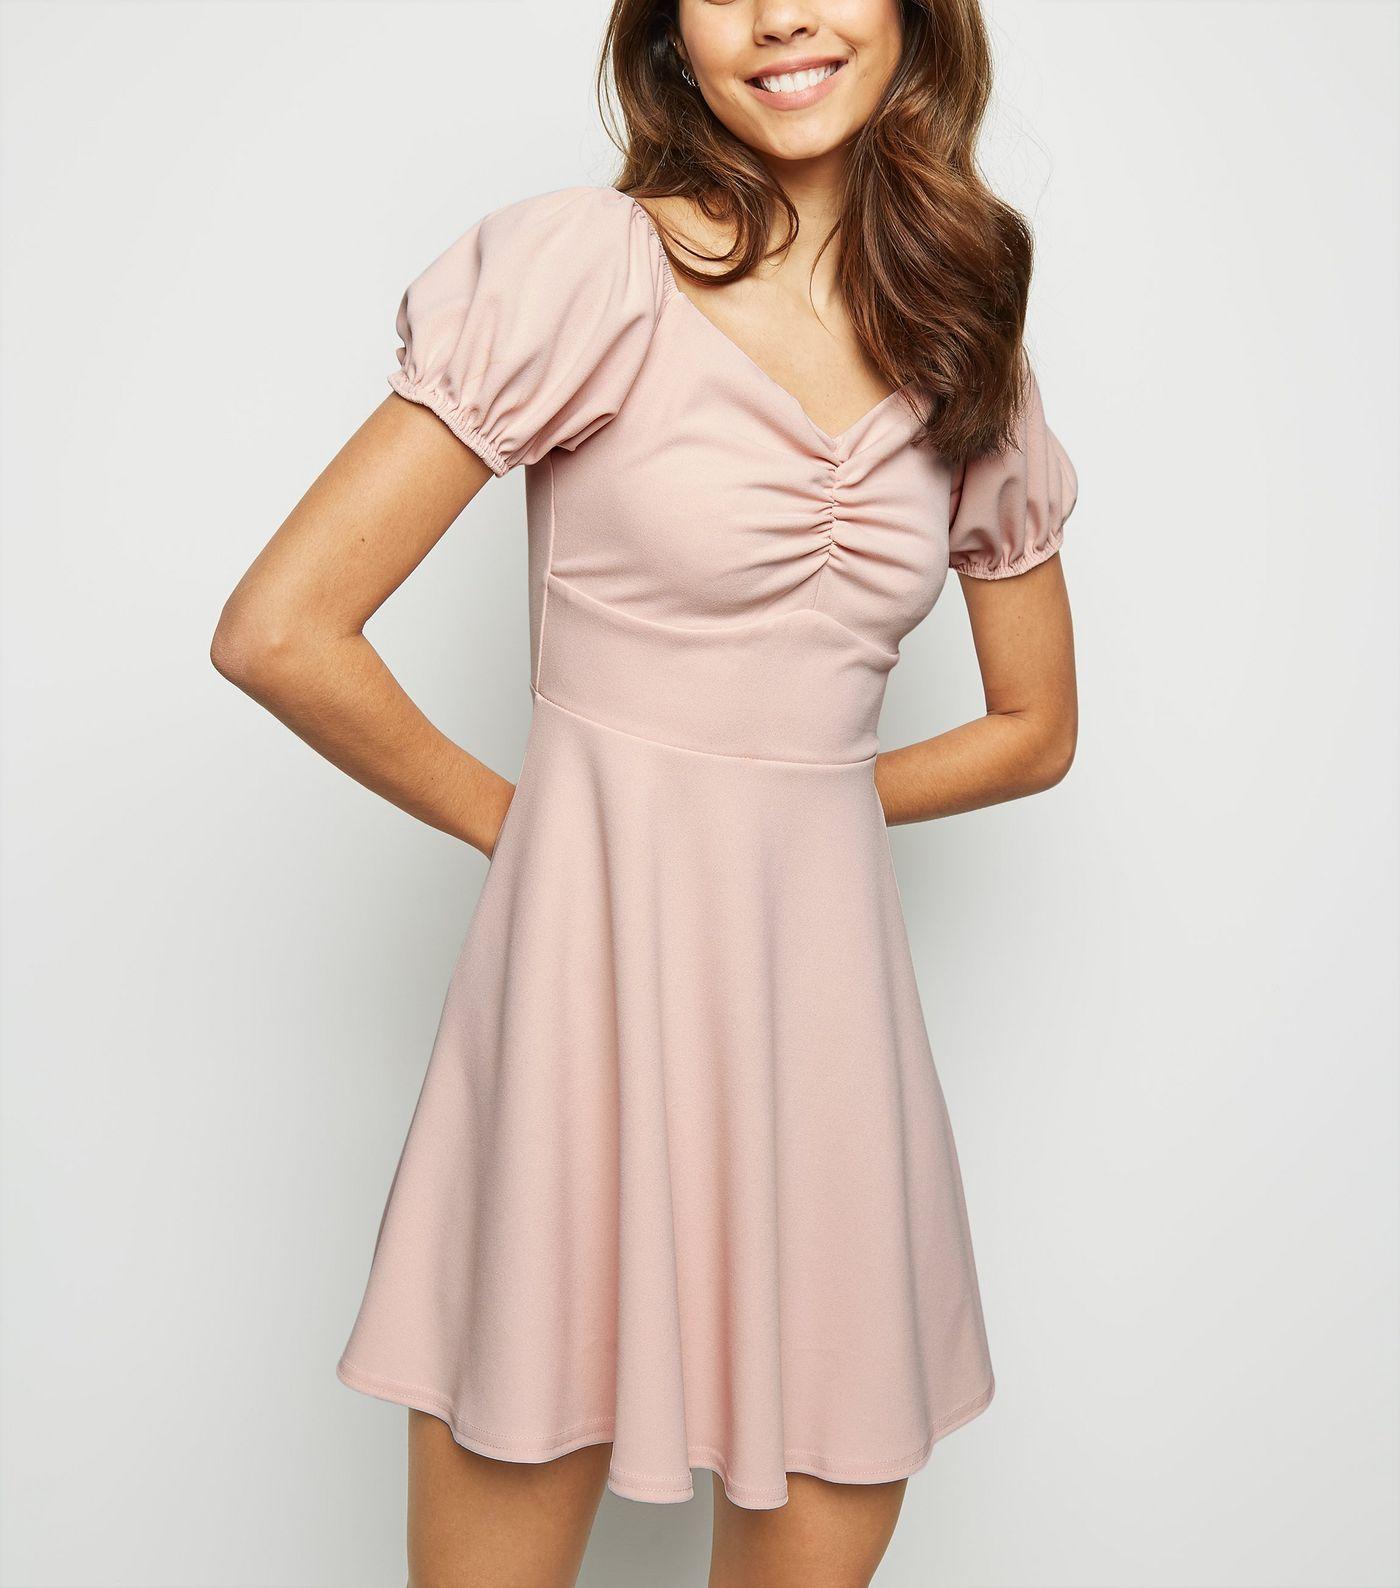 b480db975a Beach Dresses And Cover Ups New Look | Saddha